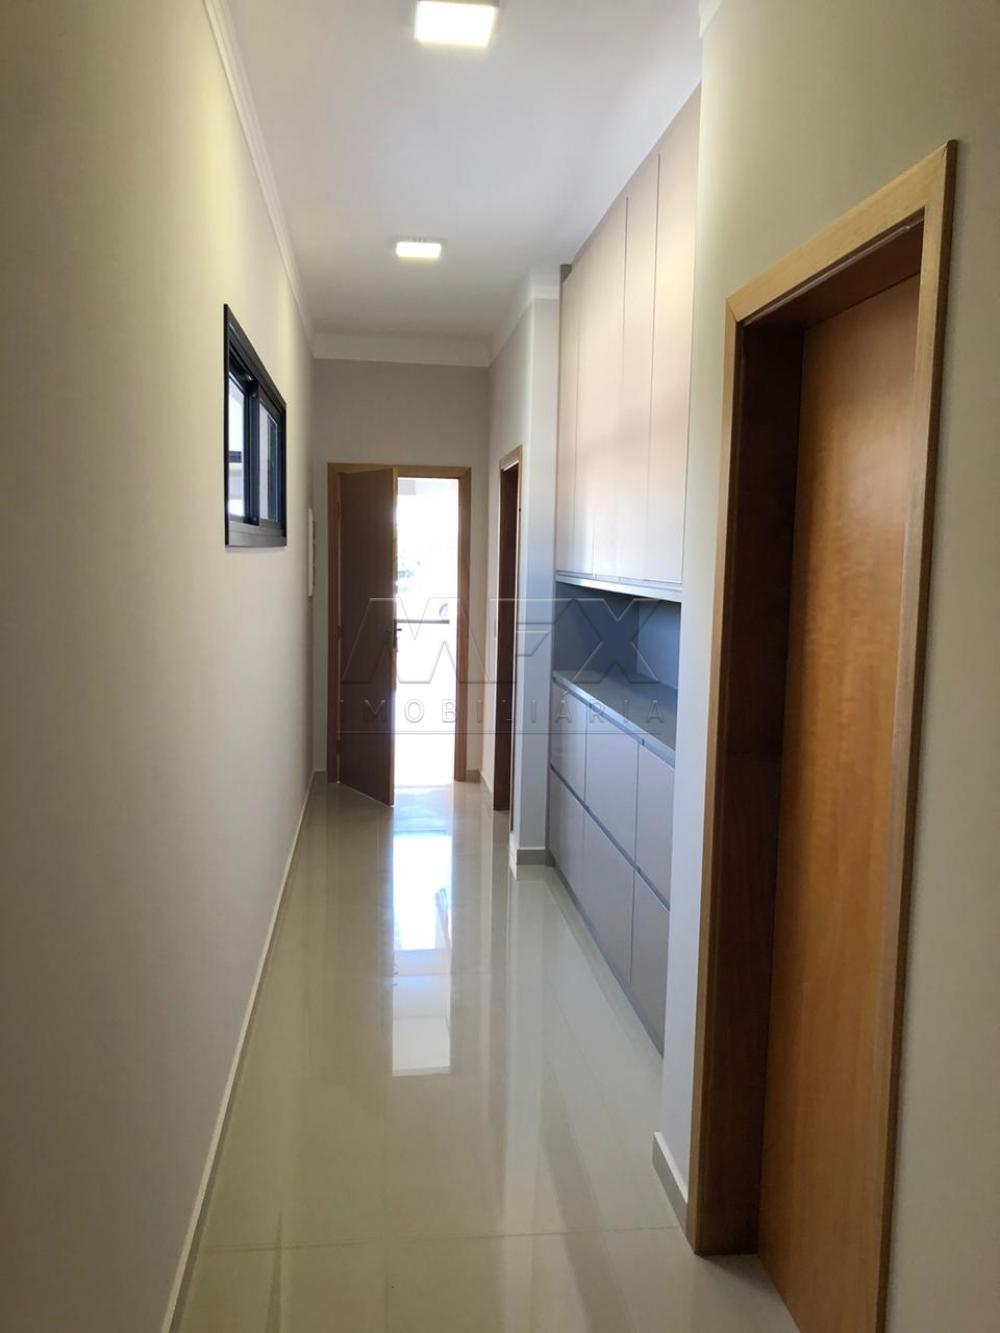 Comprar Casa / Condomínio em Bauru apenas R$ 1.600.000,00 - Foto 6